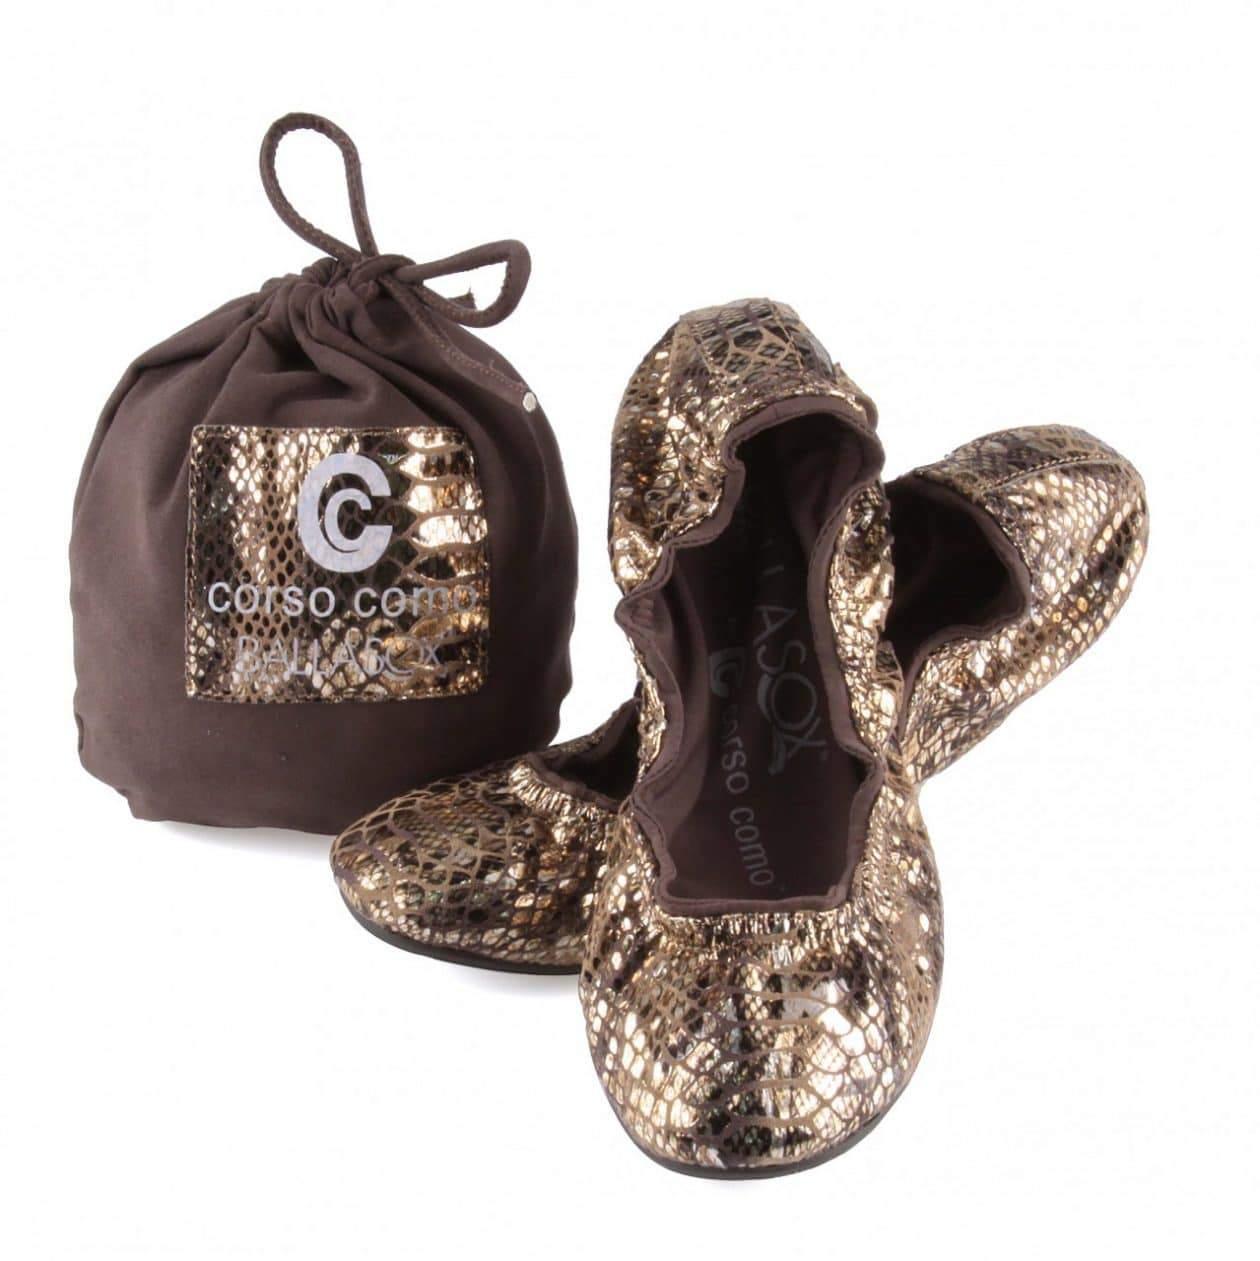 Ballasox saved my feet at #Blogher